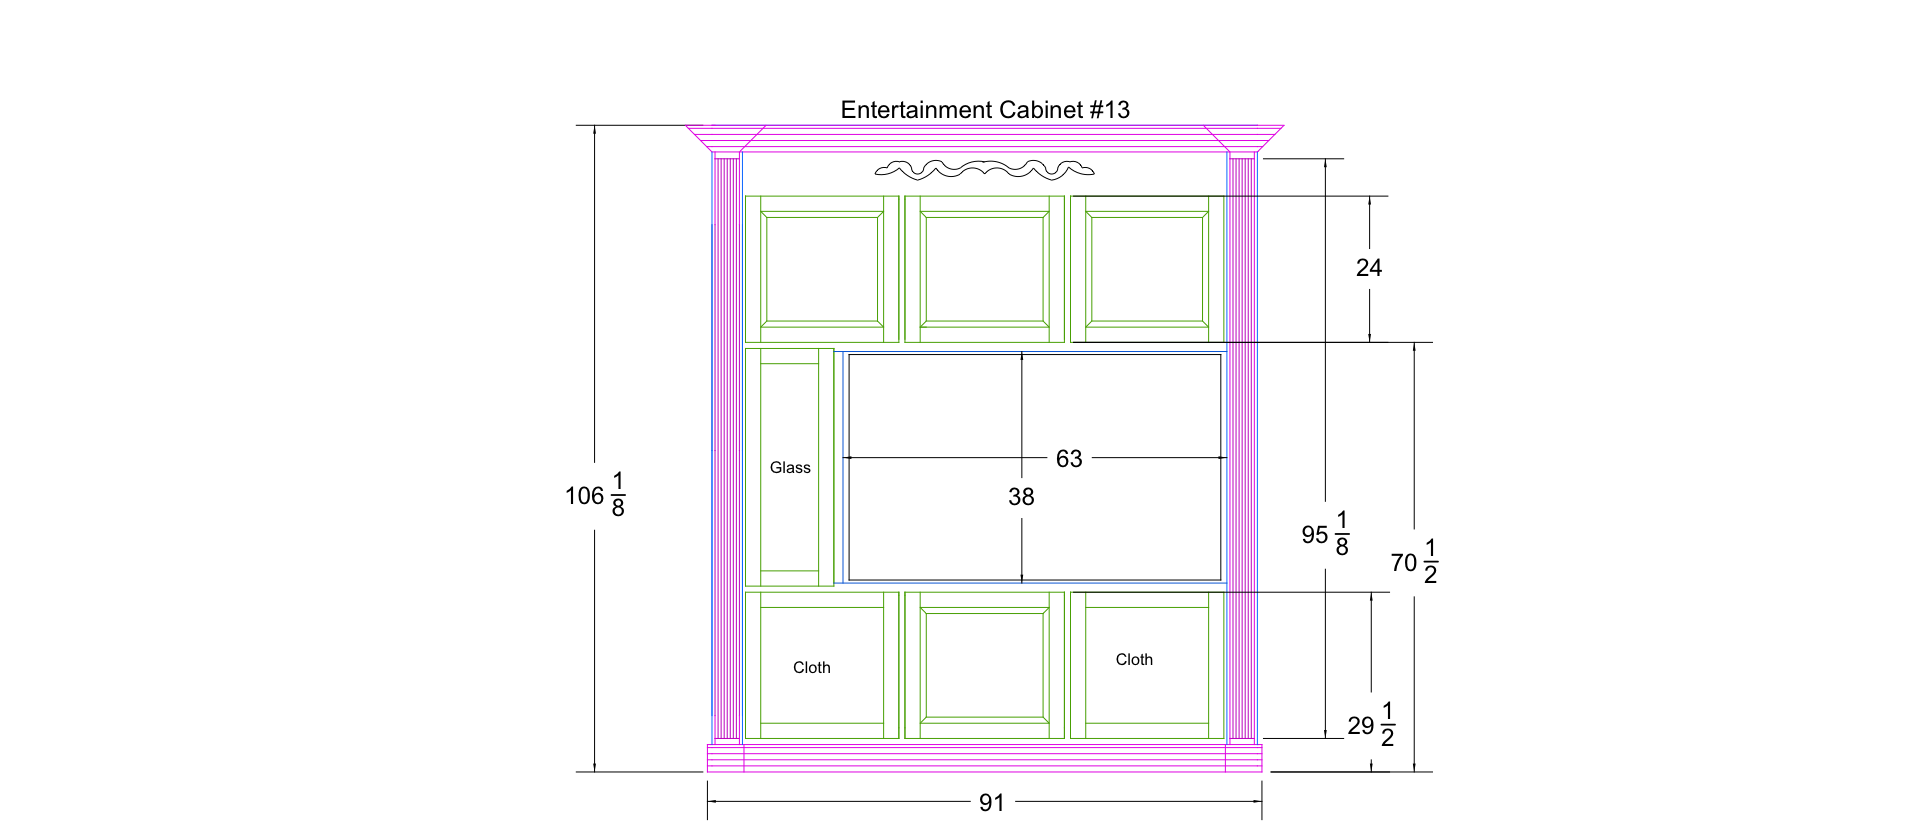 Entertainment Cabinet #13.png